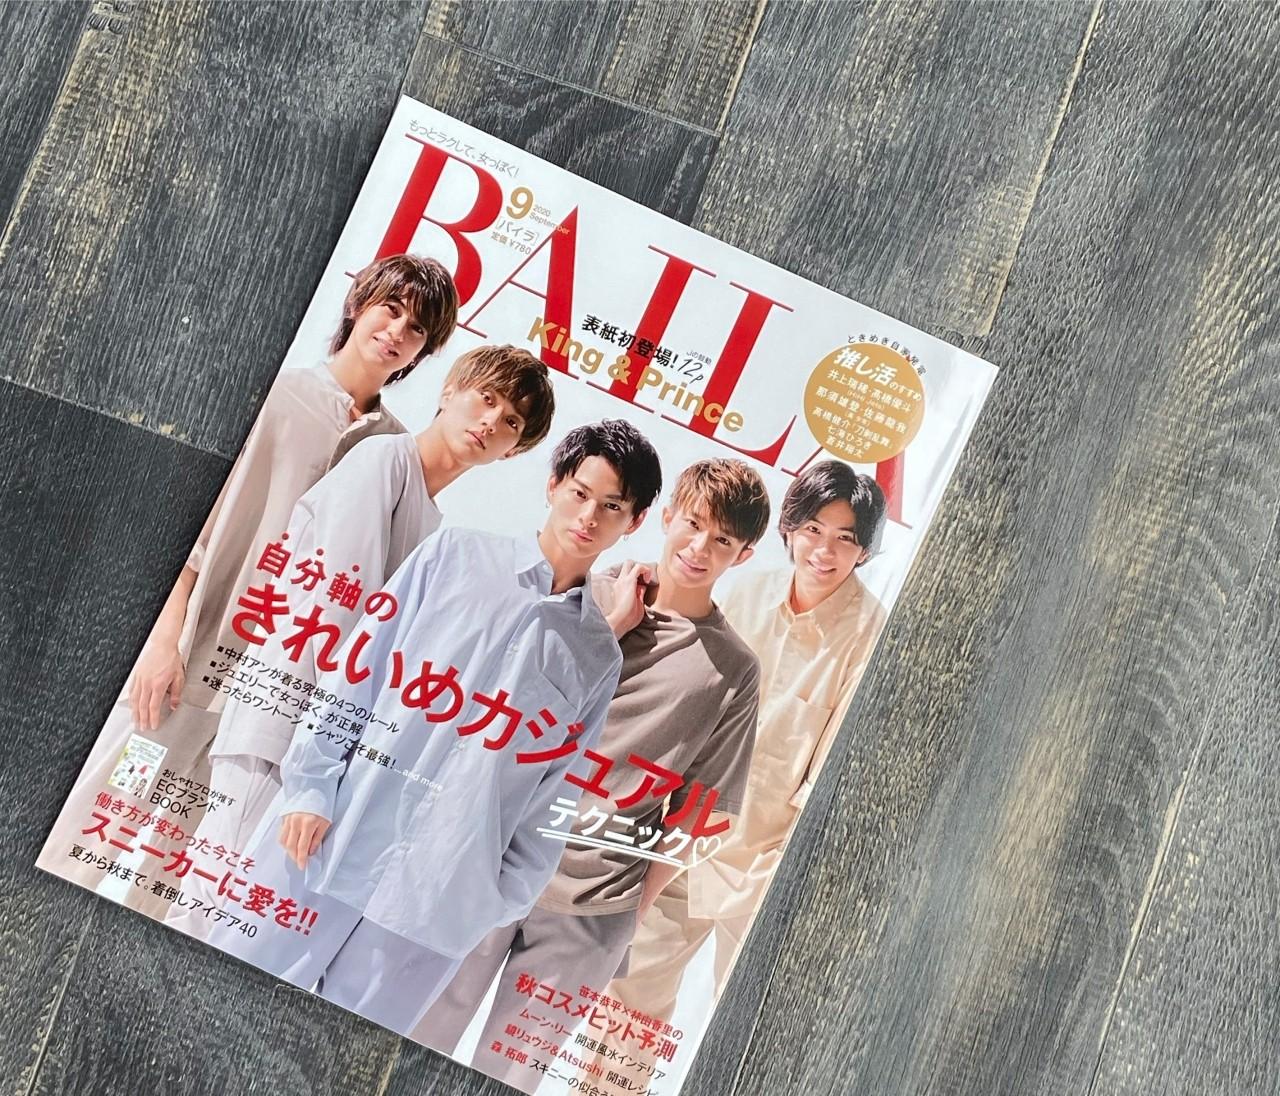 BAILA9月号はキンプリが表紙♪今月号の読みどころは?